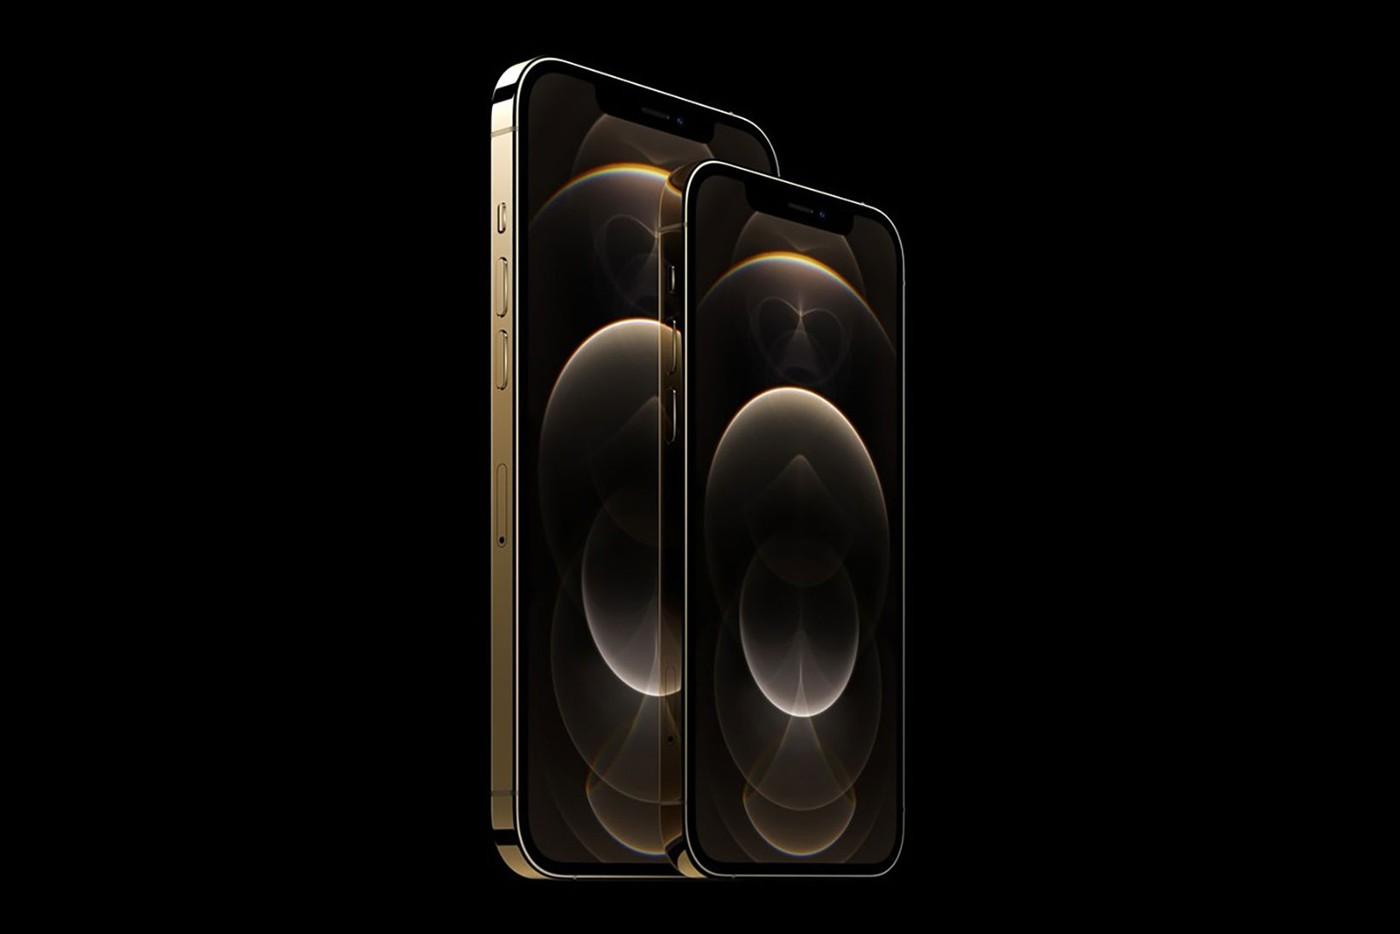 apple iphone 13 airpods 3 release date rumor info